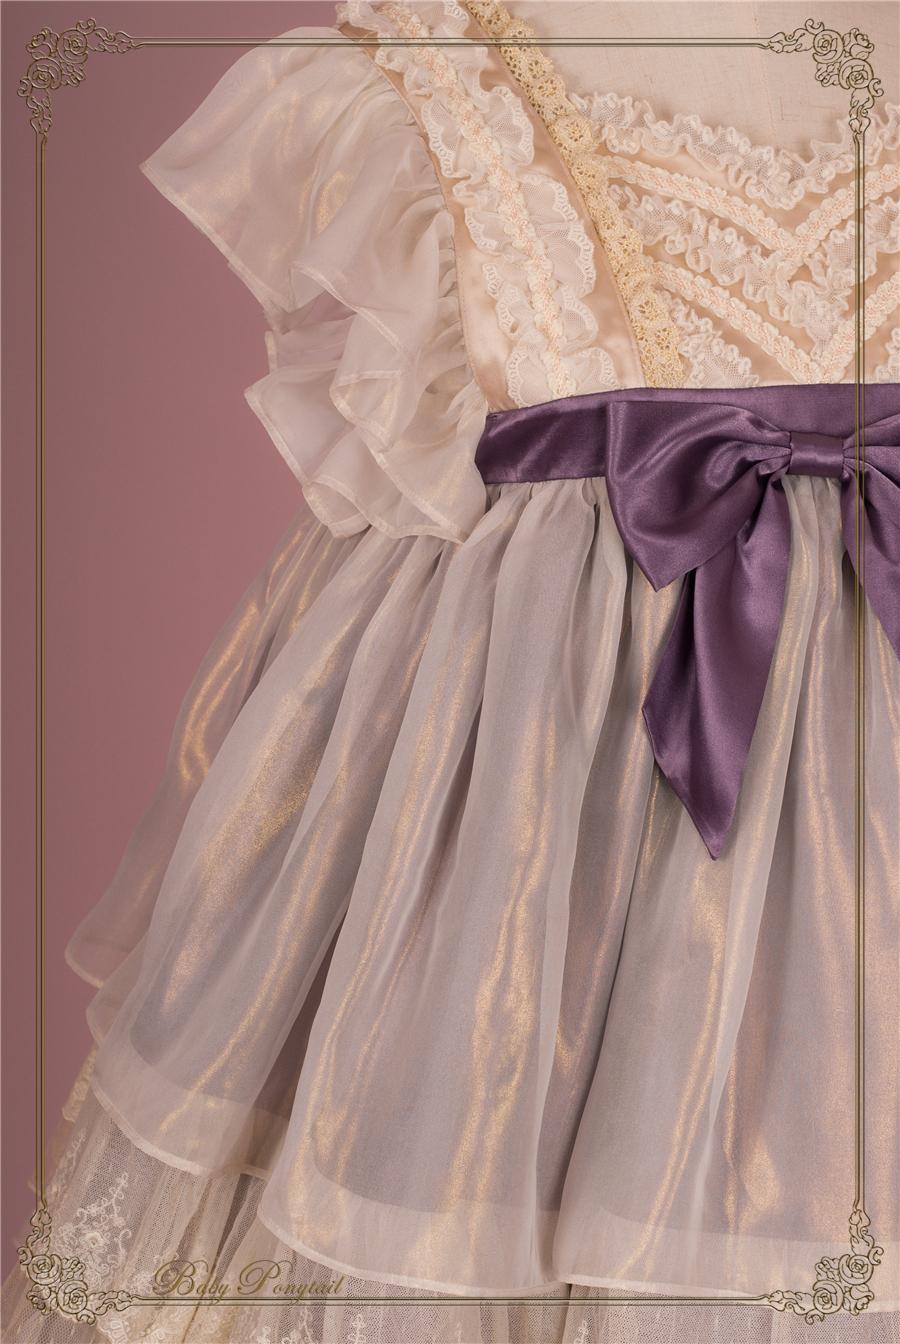 Babyponytail_Stock Photo_Present Angel_JSK Lavender_0.jpg